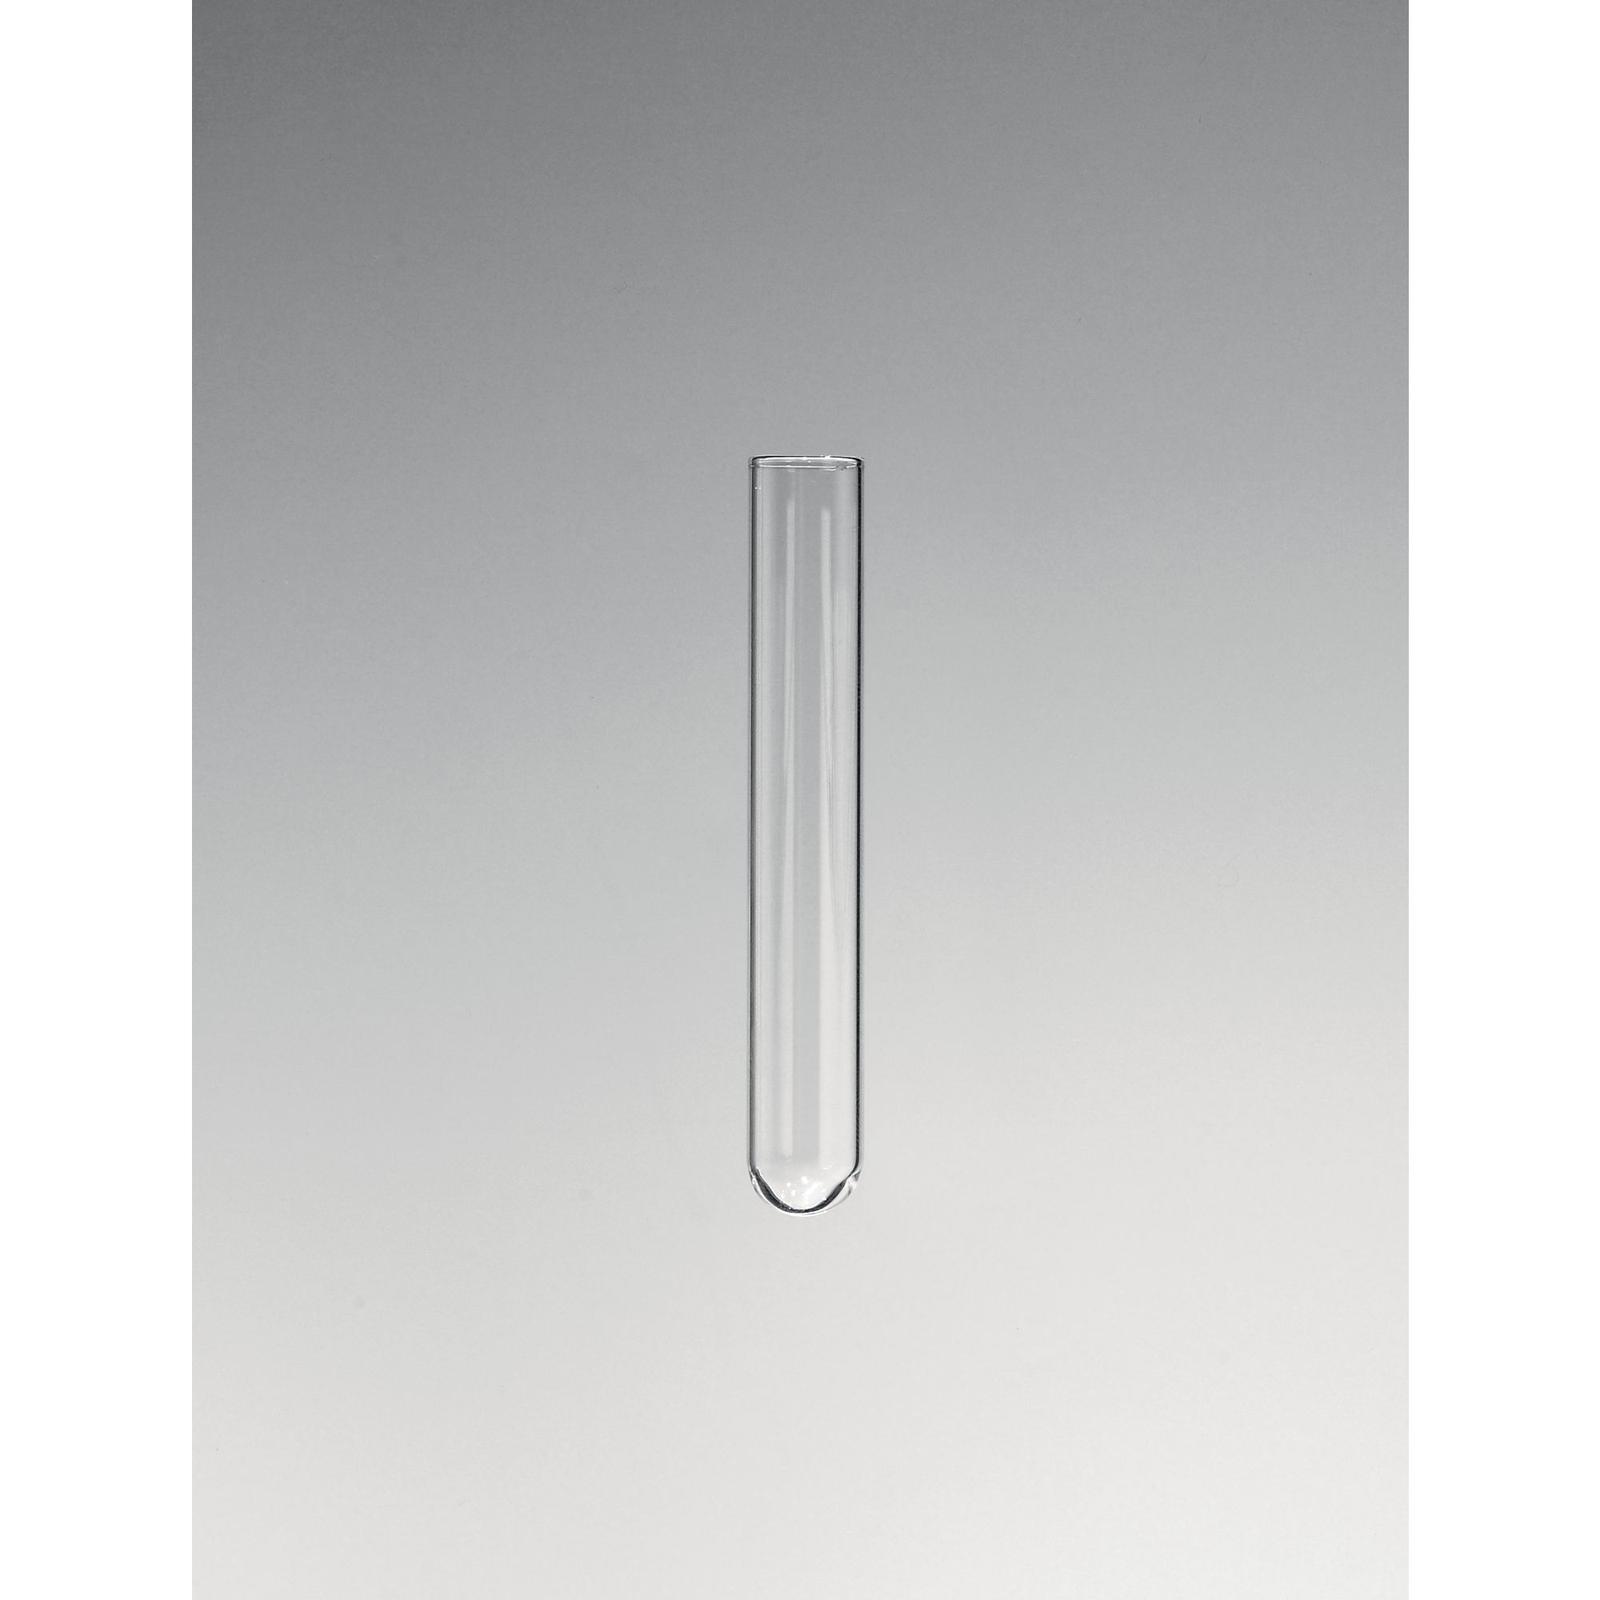 Philip Harris Rimless Test Tube 16 x 125mm